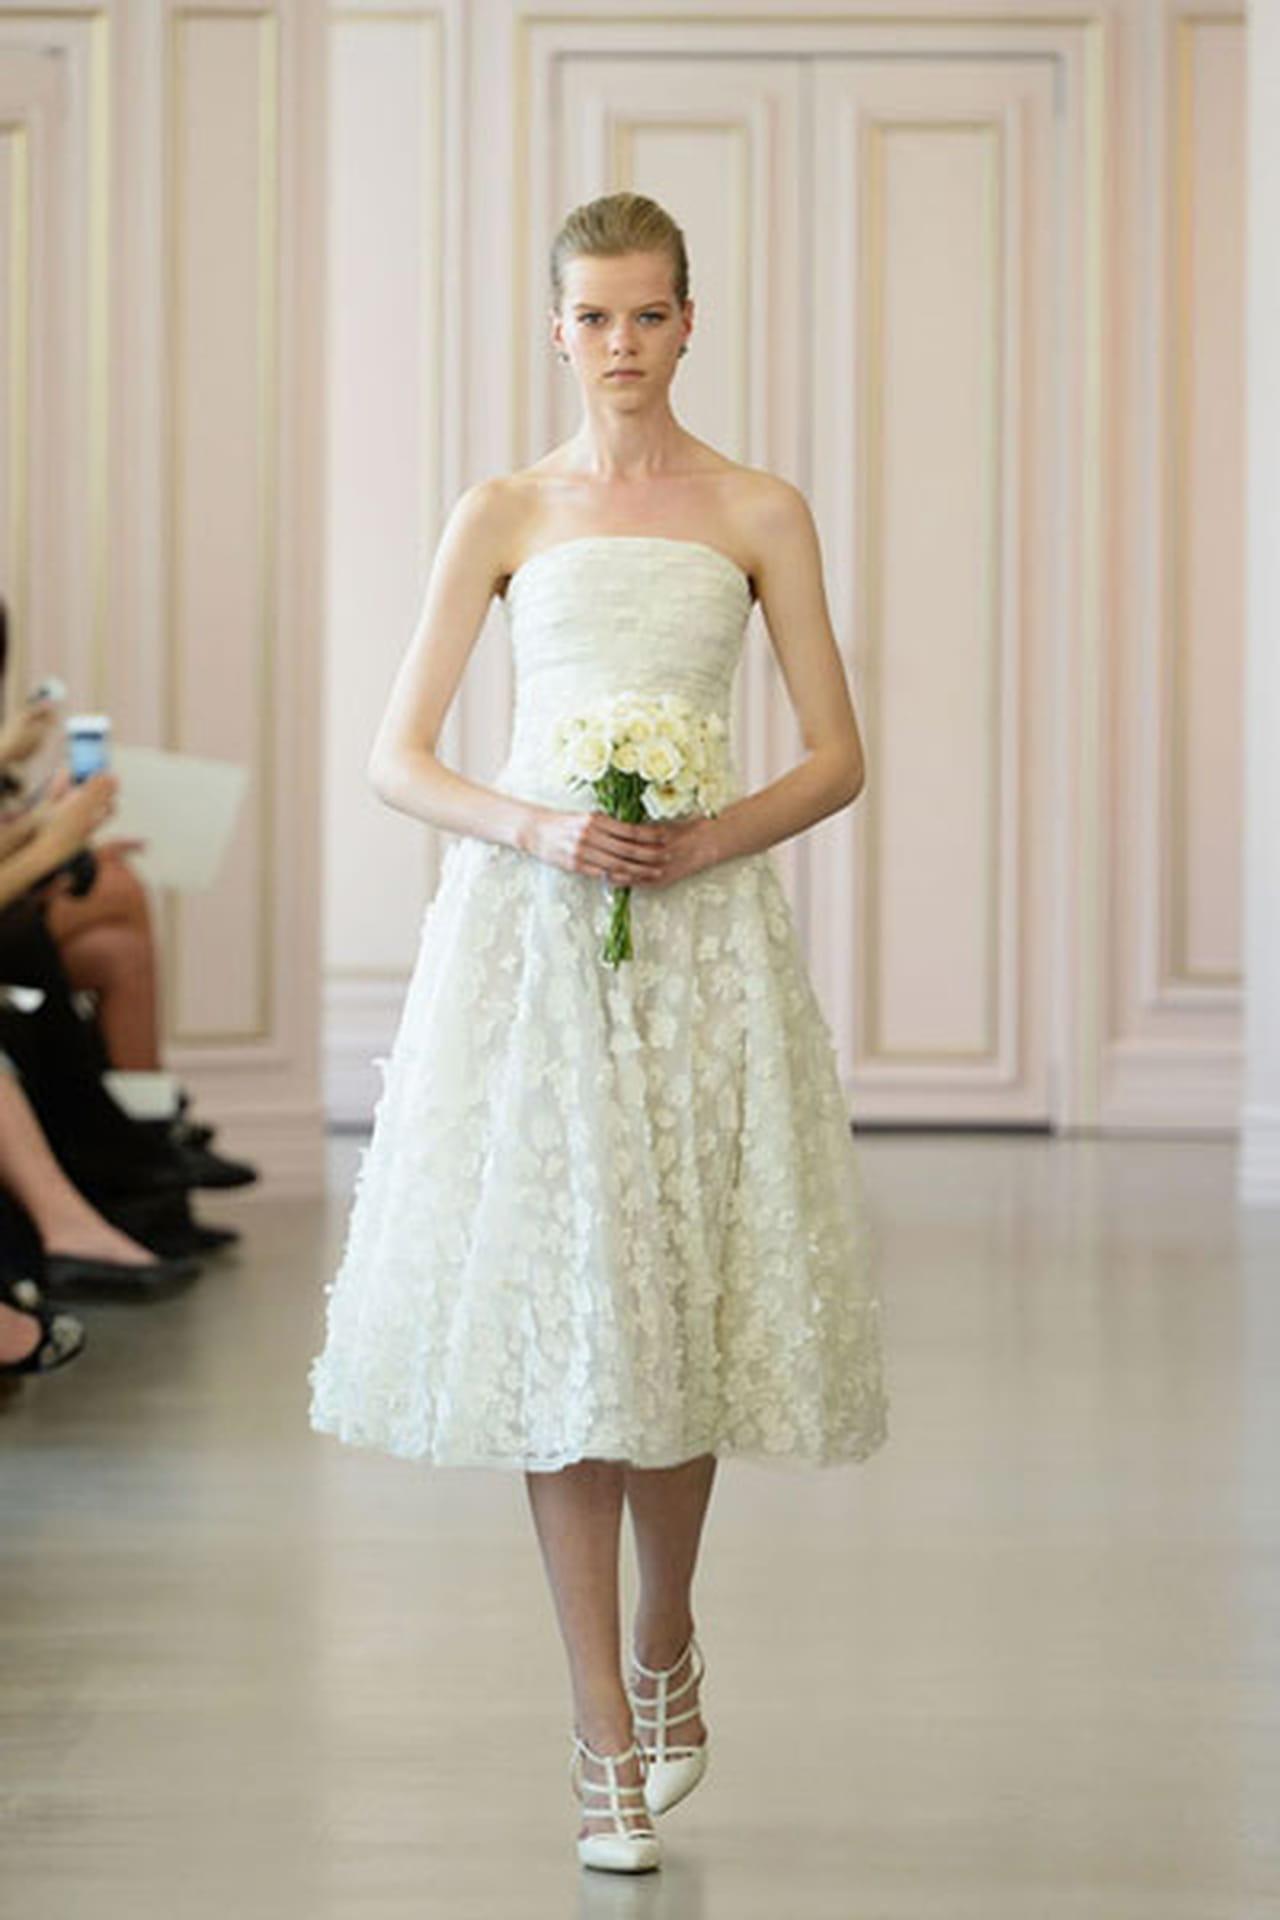 d59e6bb81 نفحات الورود تزين فساتين زفاف 2016